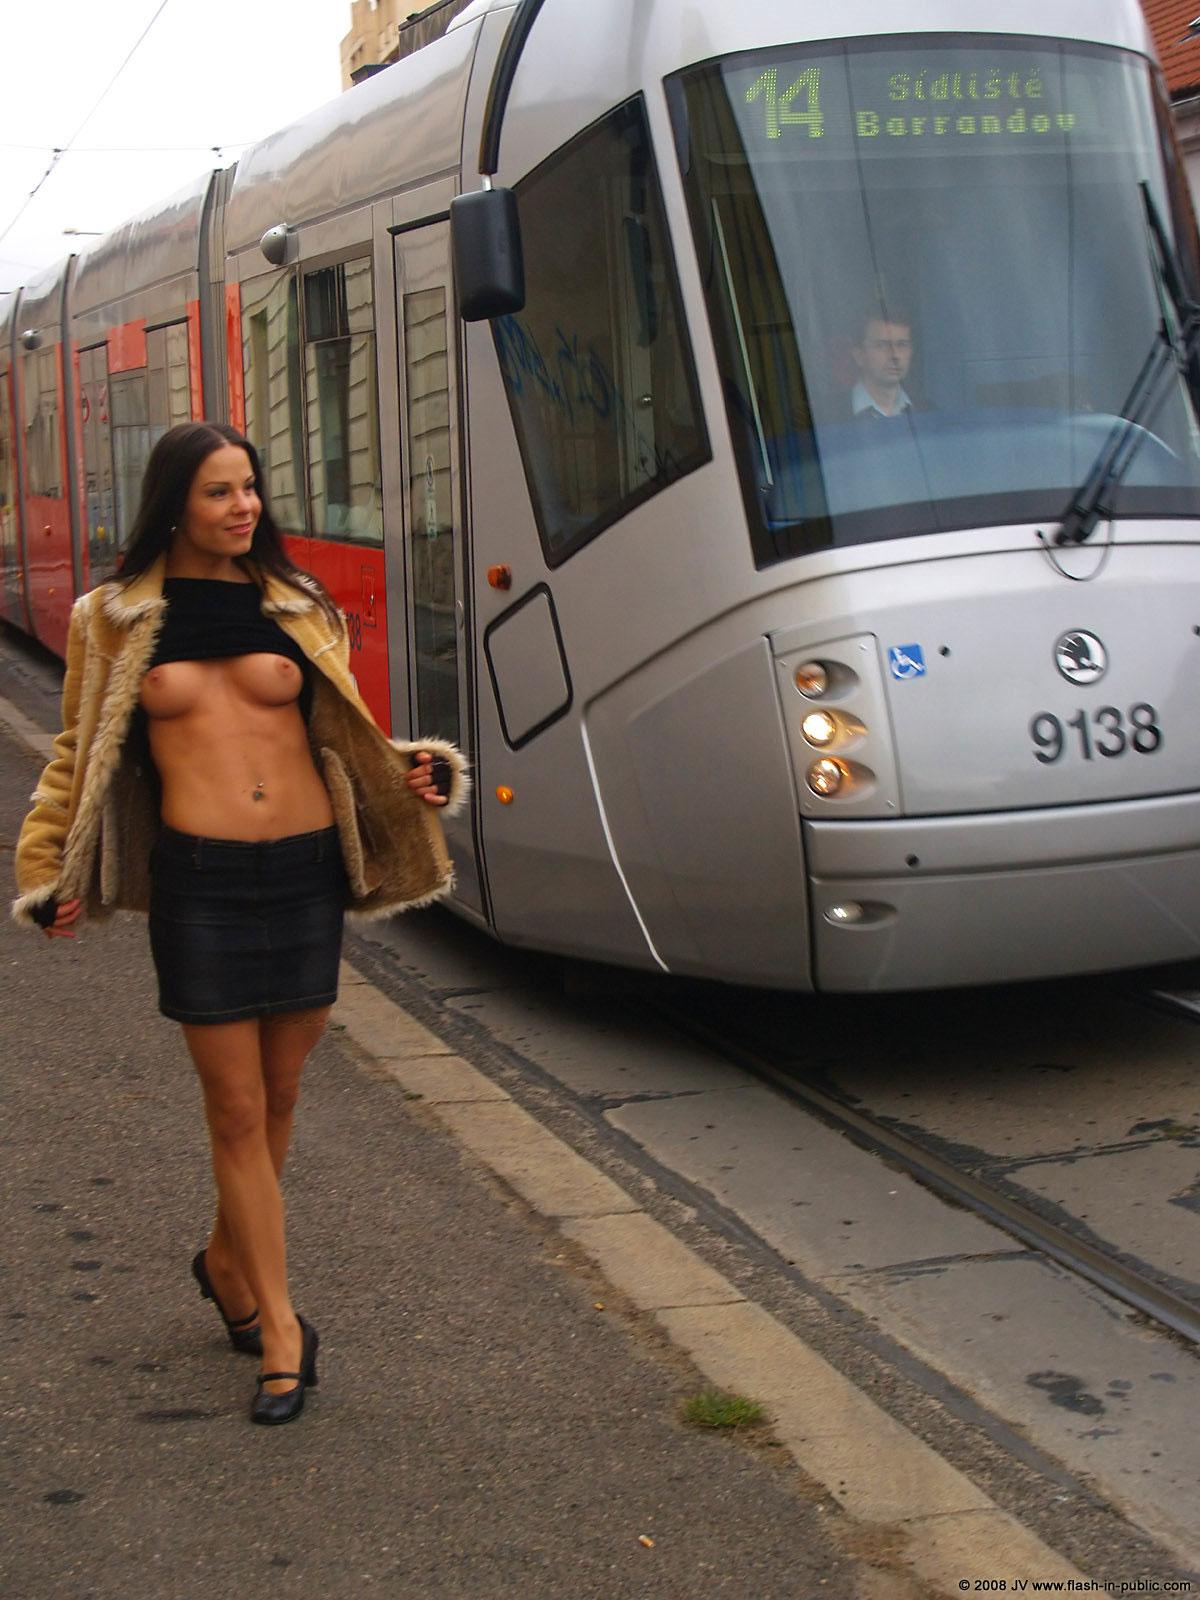 alexandra-g-bottomless-stockings-flash-in-public-36